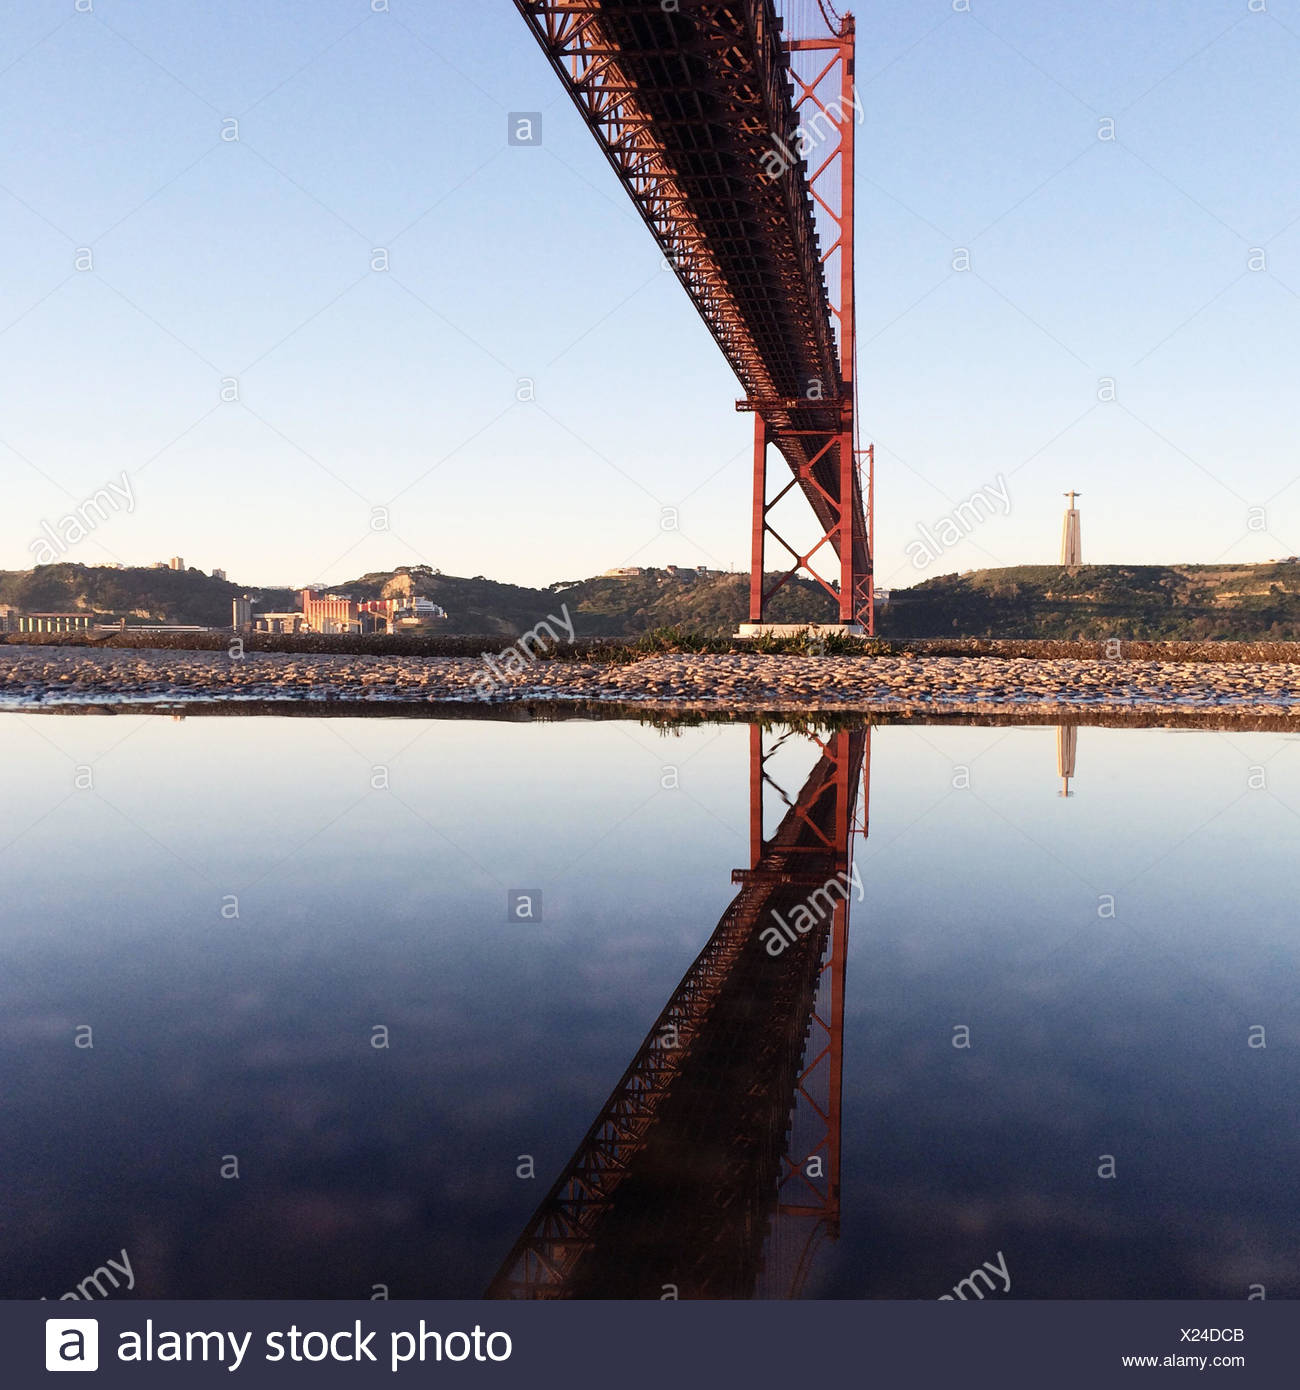 Bridge across a river, Portugal Stock Photo